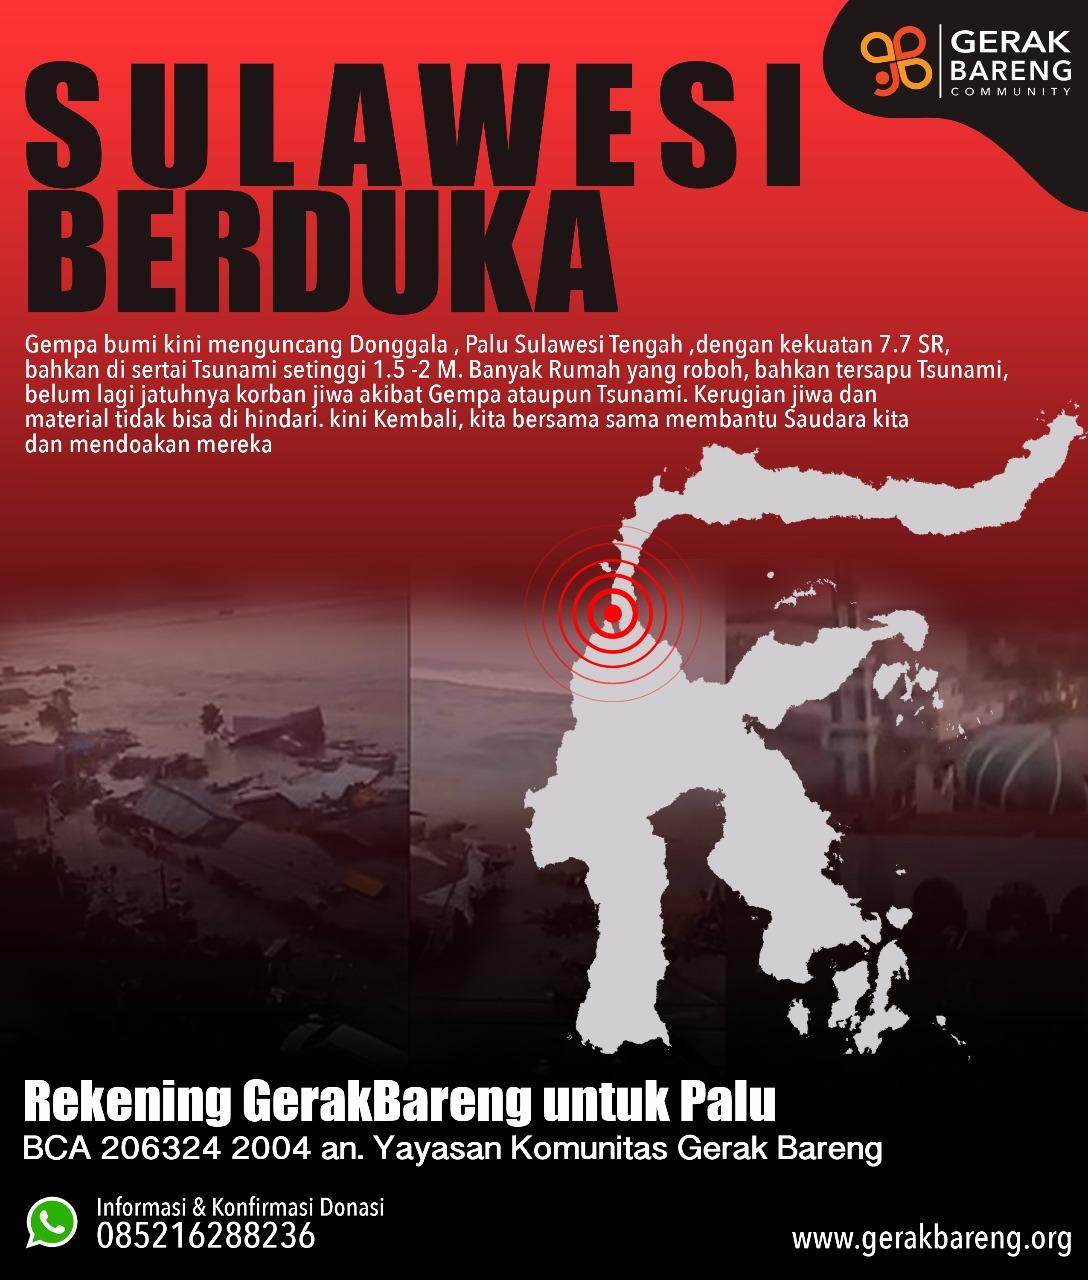 Merawat Lombok, Menjaga Palu